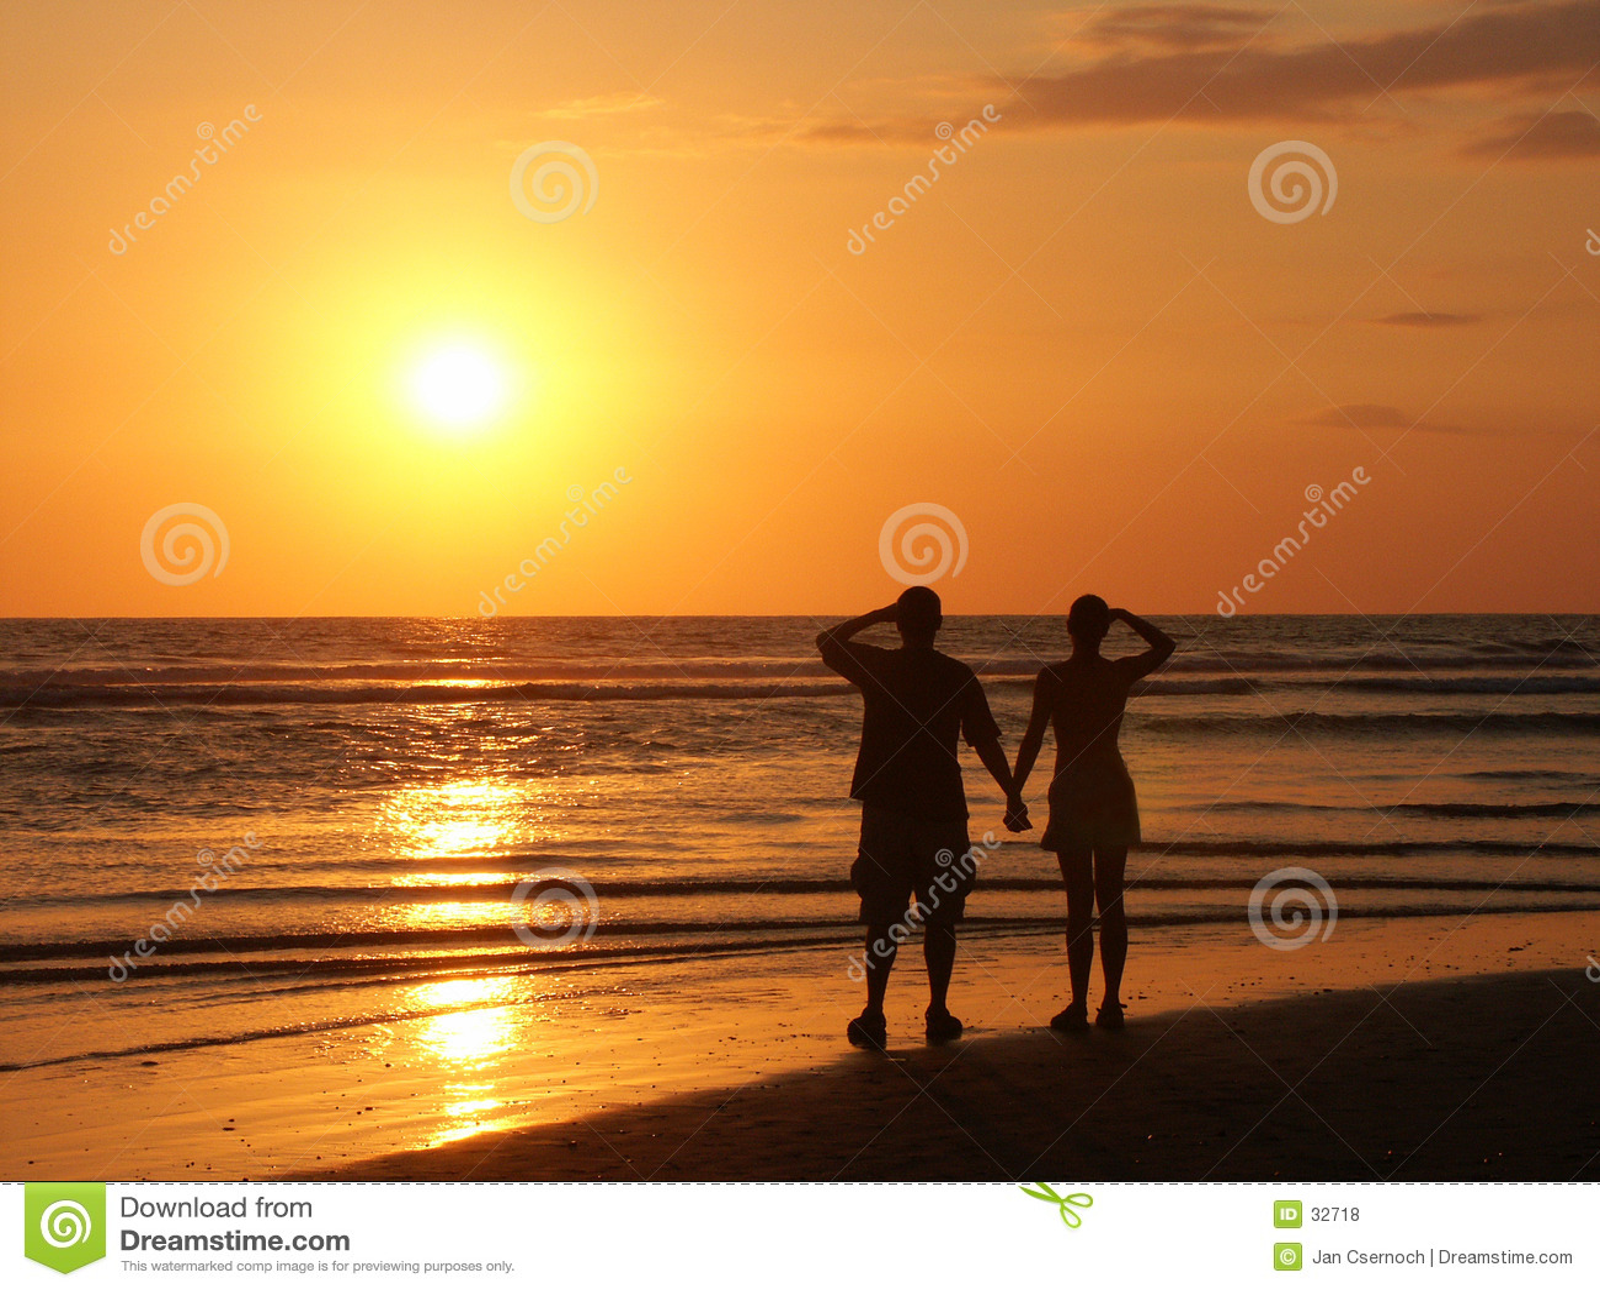 Couple watching the setting sun